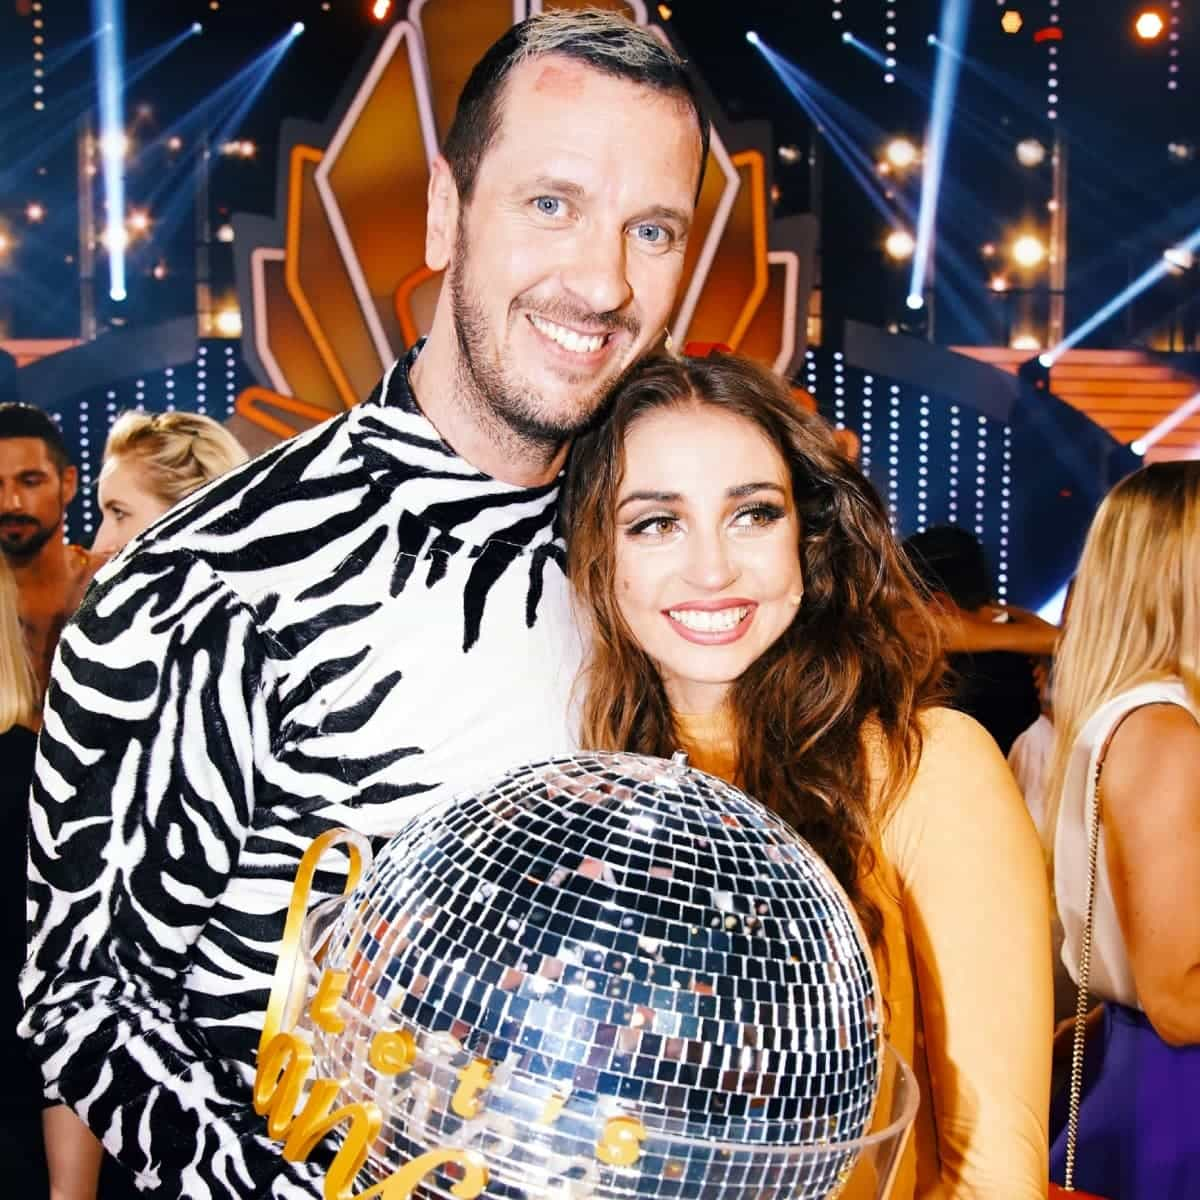 Sieger Let's dance 2019 Pascal Hens - Ekaterina Leonova